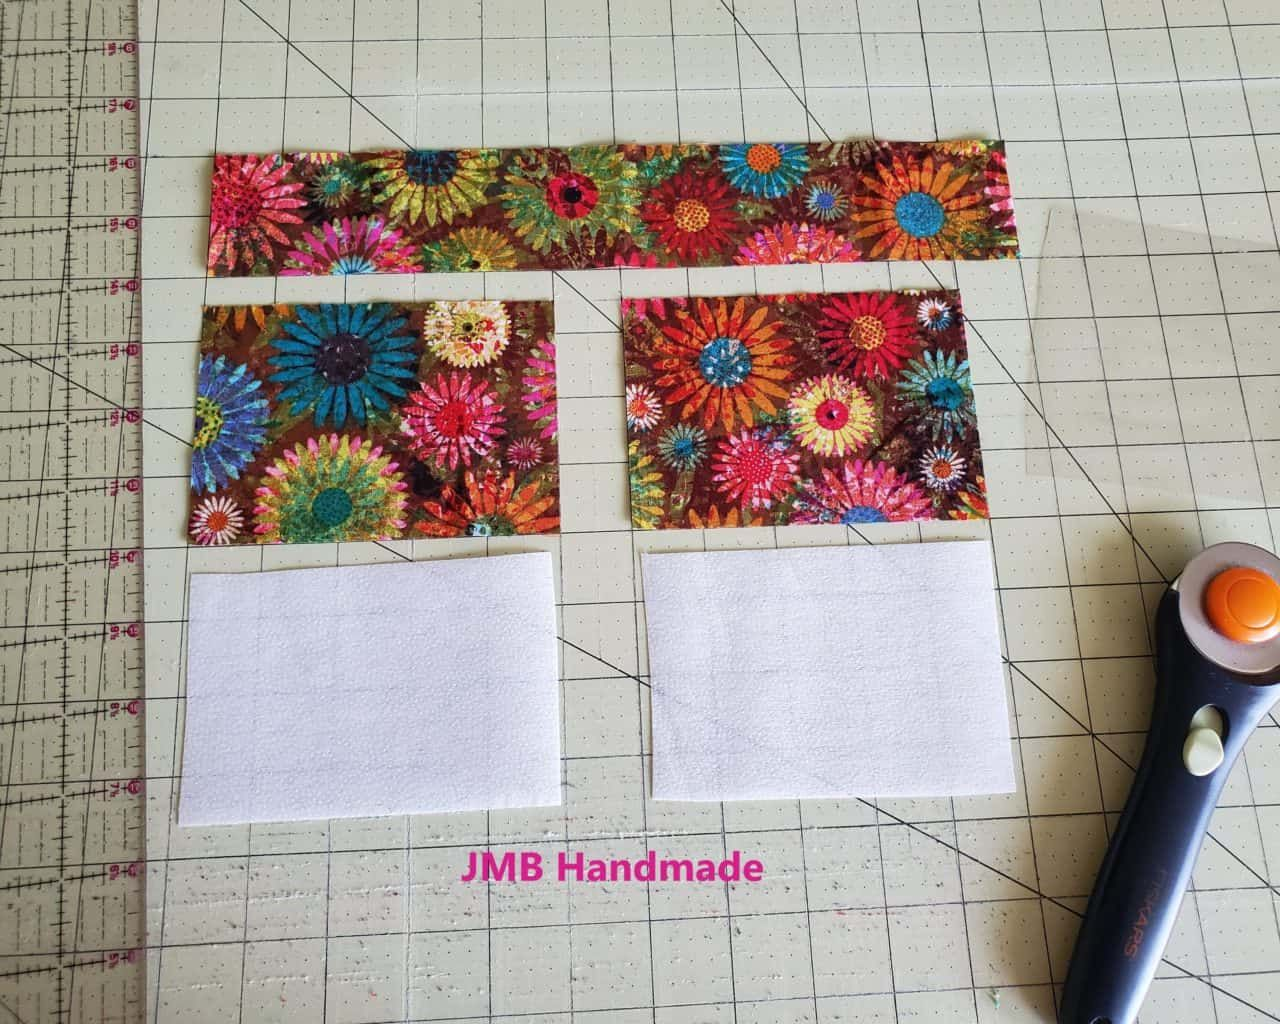 How To Sew A Fabric Luggage Tag Jmb Handmade Luggage Tags Diy Luggage Tags Handmade